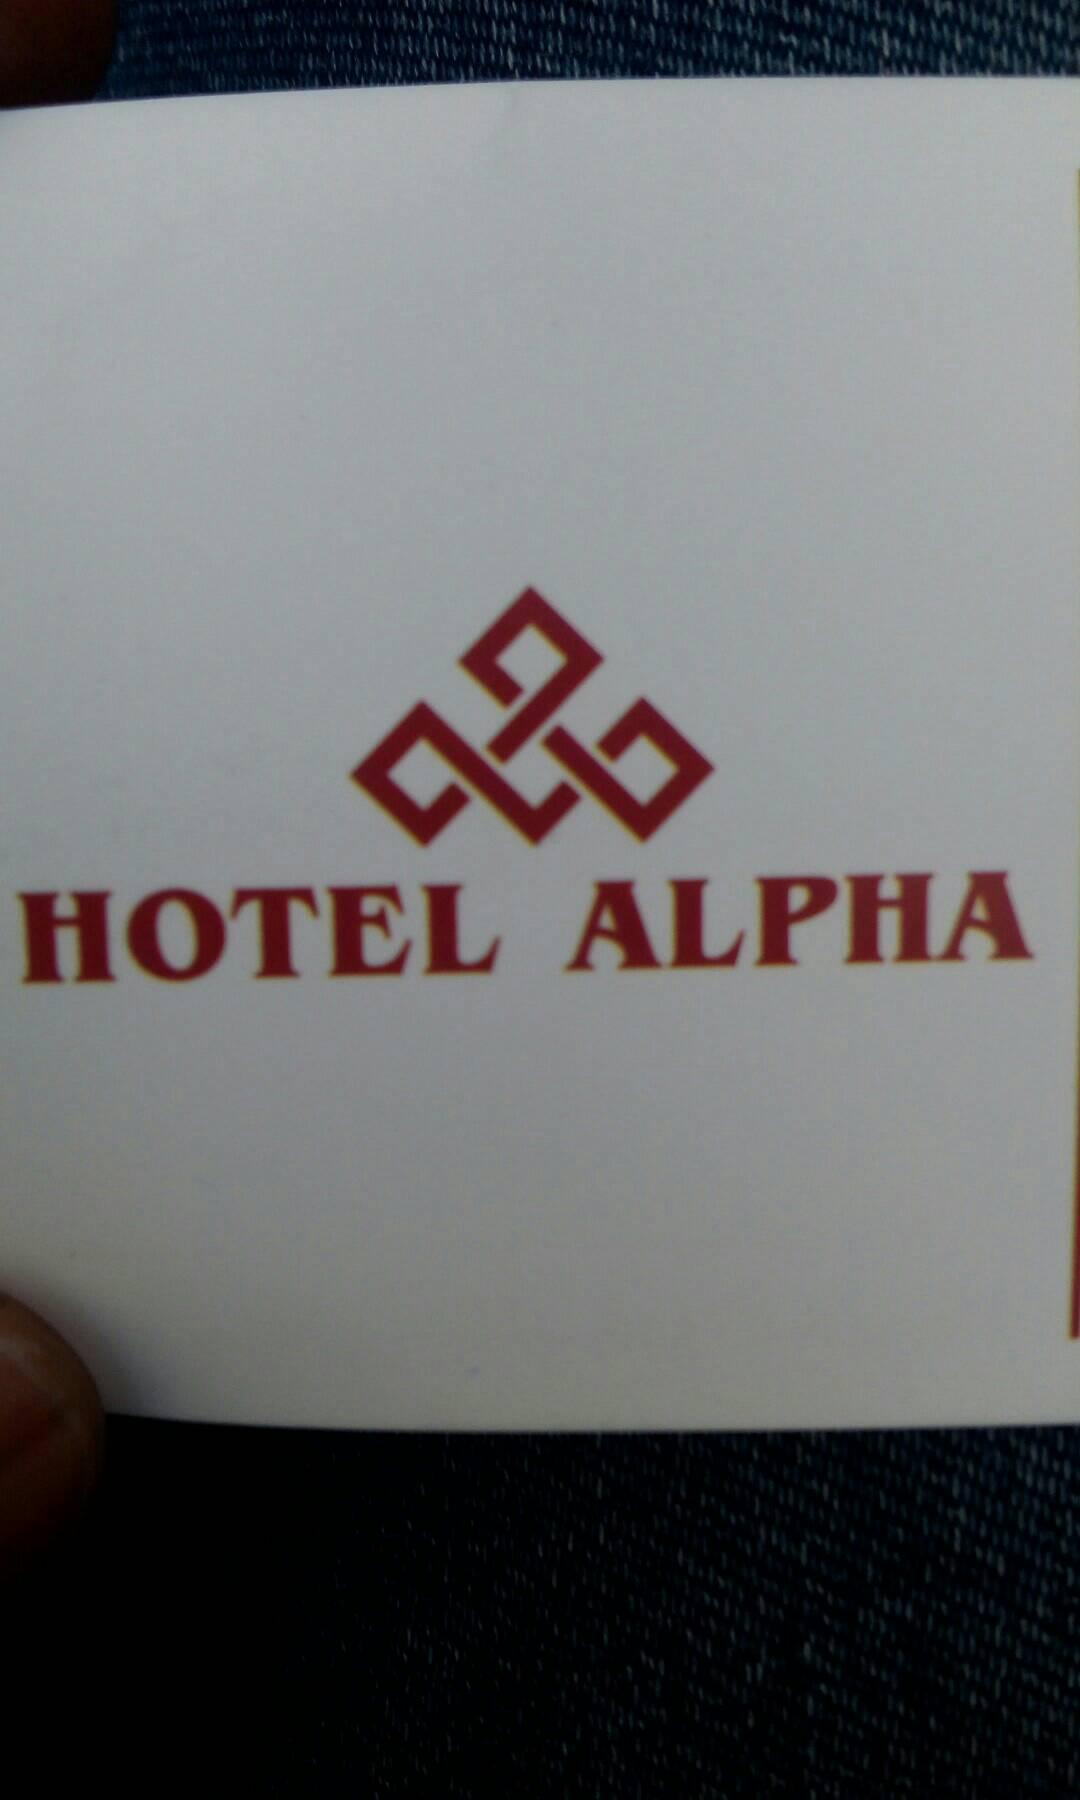 Hotel Alpha - logo